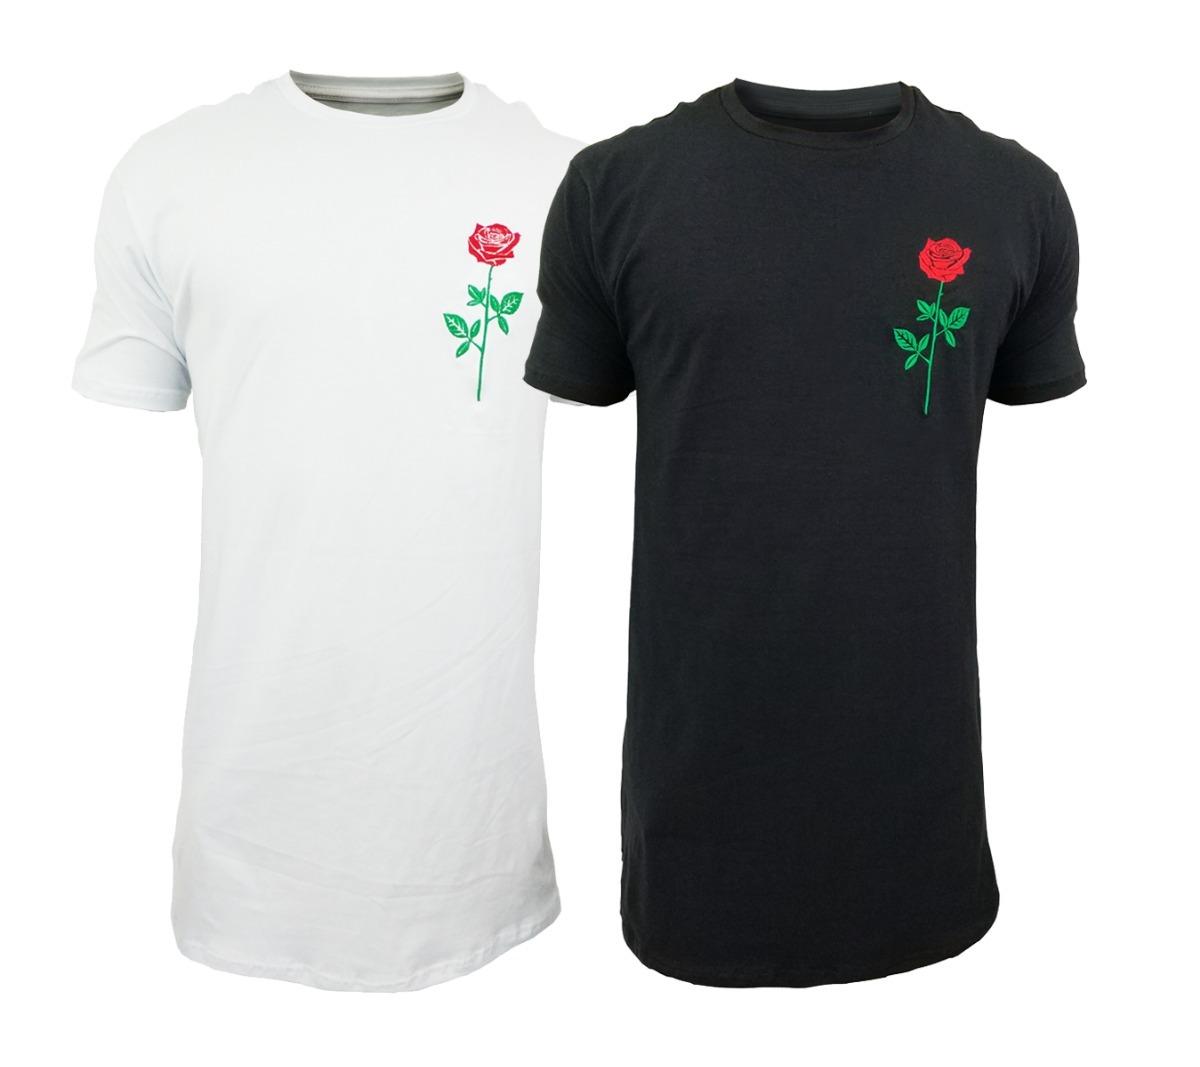 15aab83f0 camiseta camisa blusa longline oversized masculina rosa. Carregando zoom.